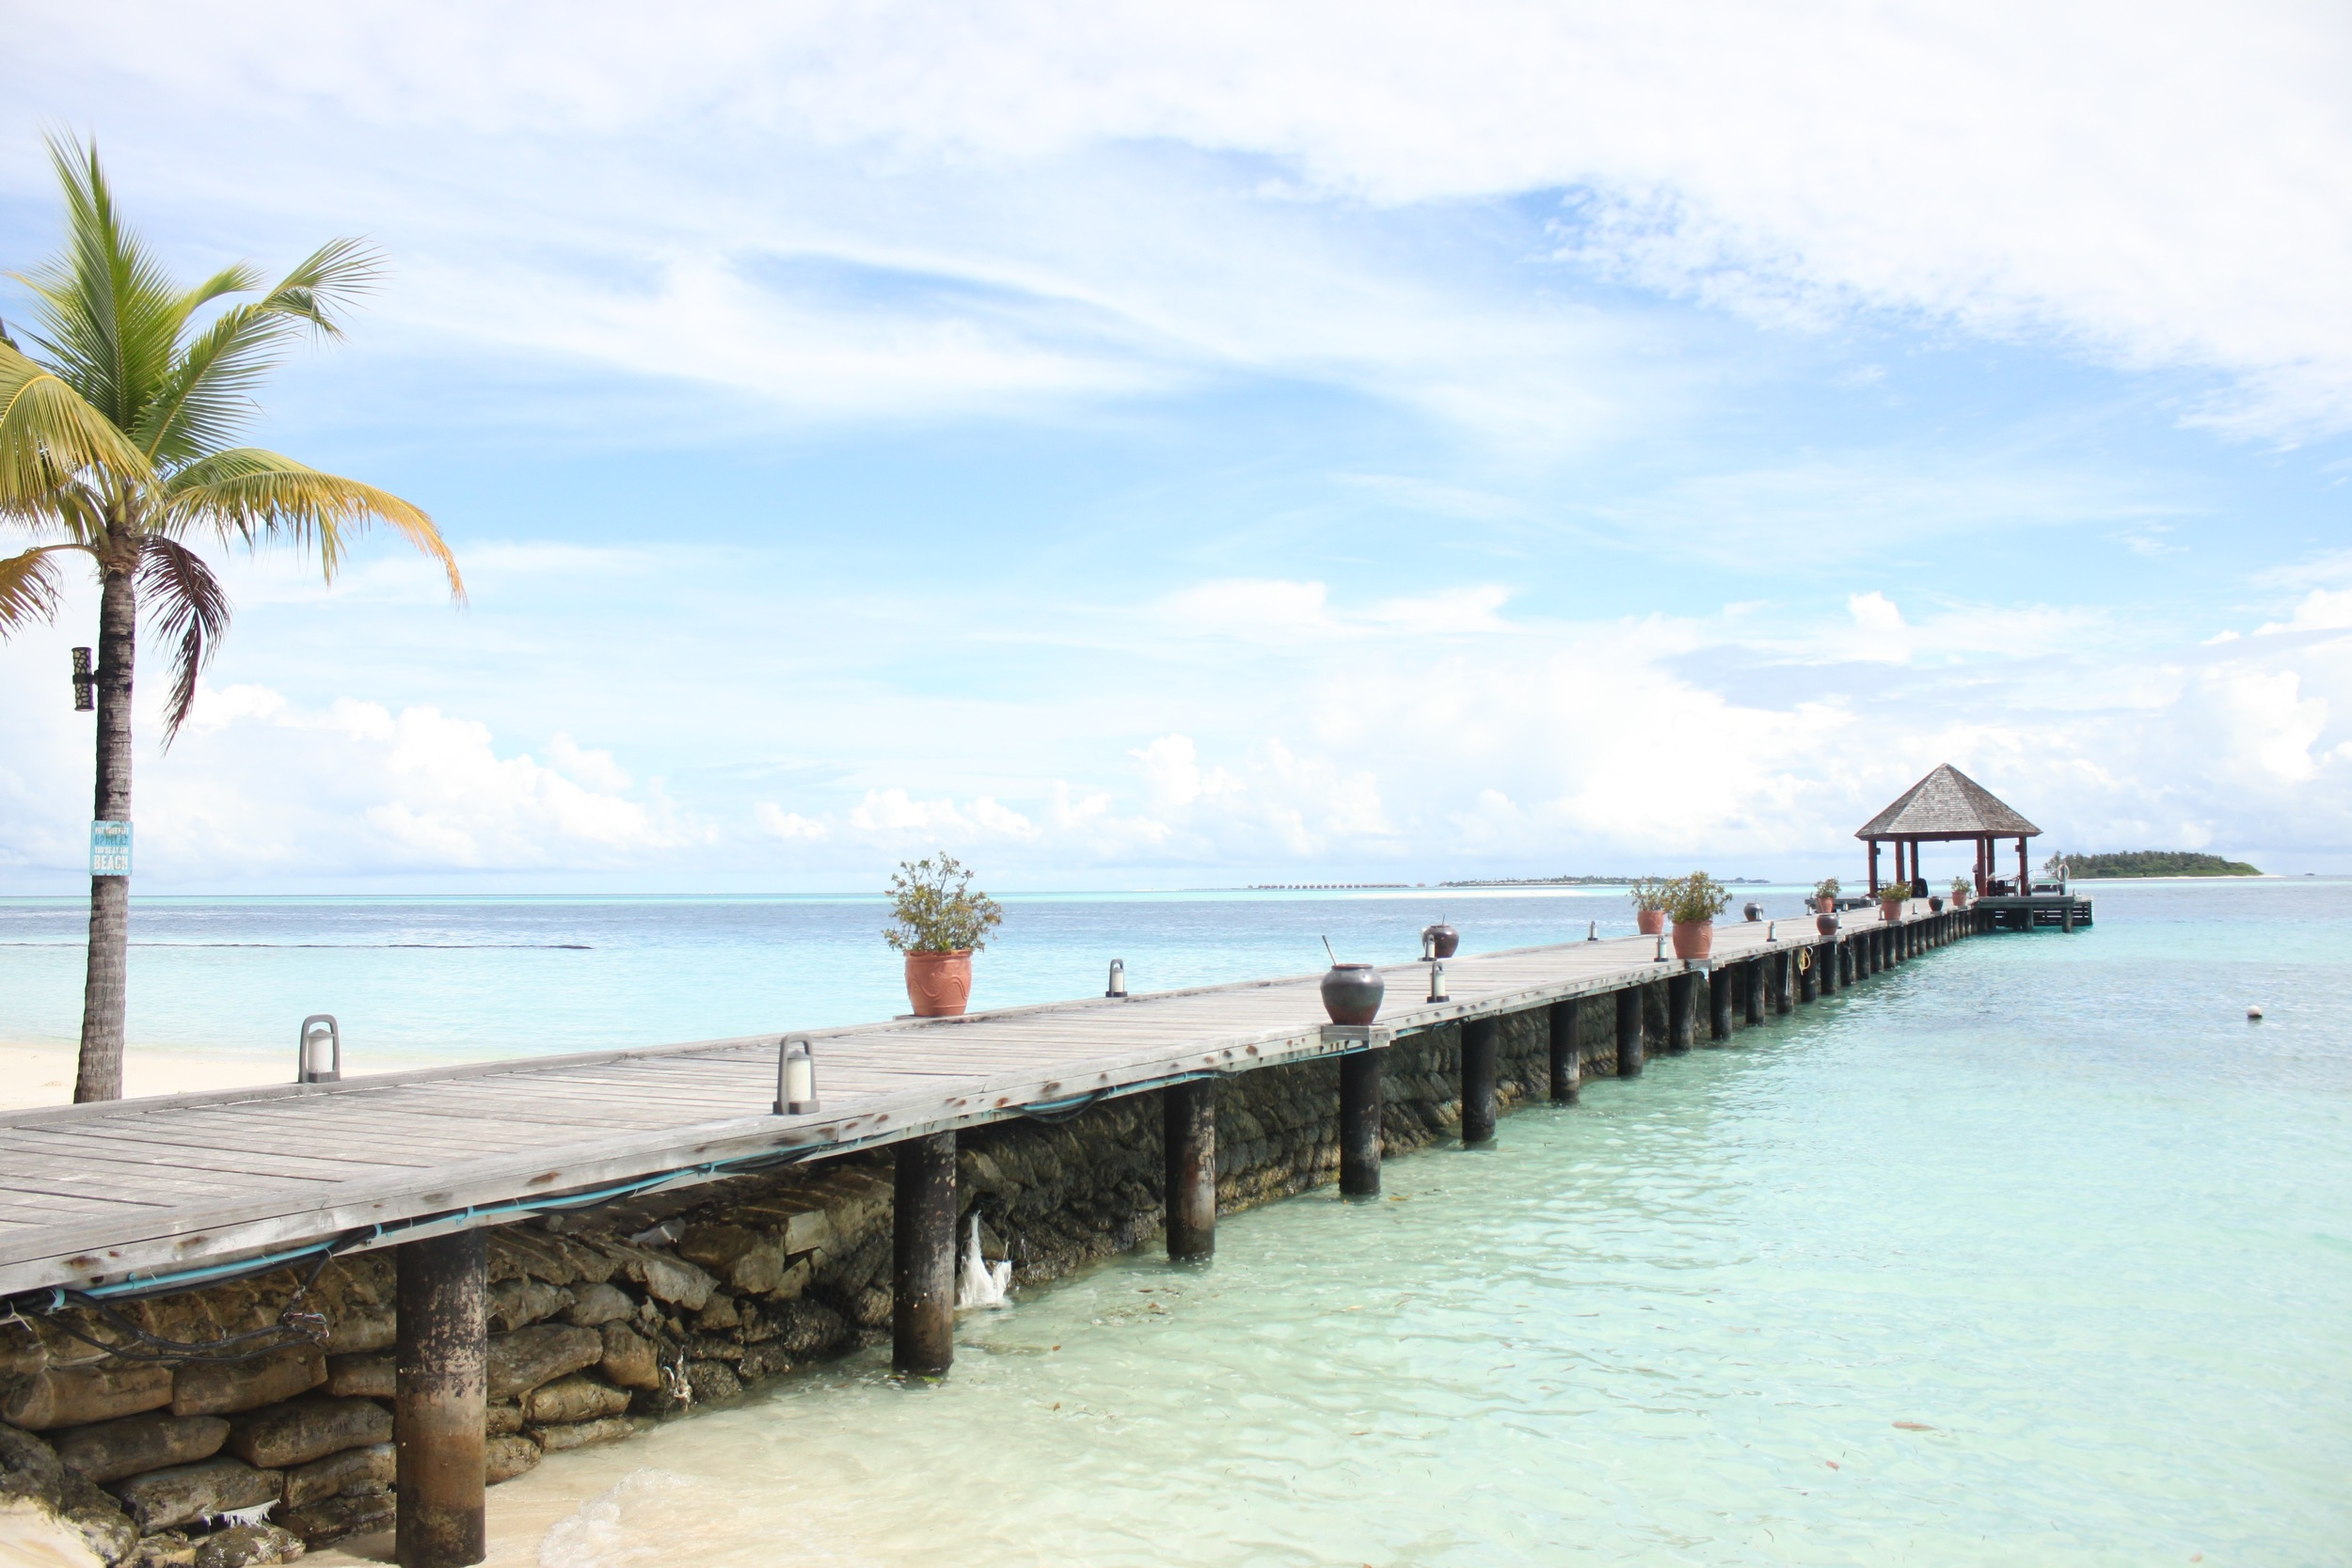 Jetti to the island/resort of Komandoo in the Lhaviyani Atoll